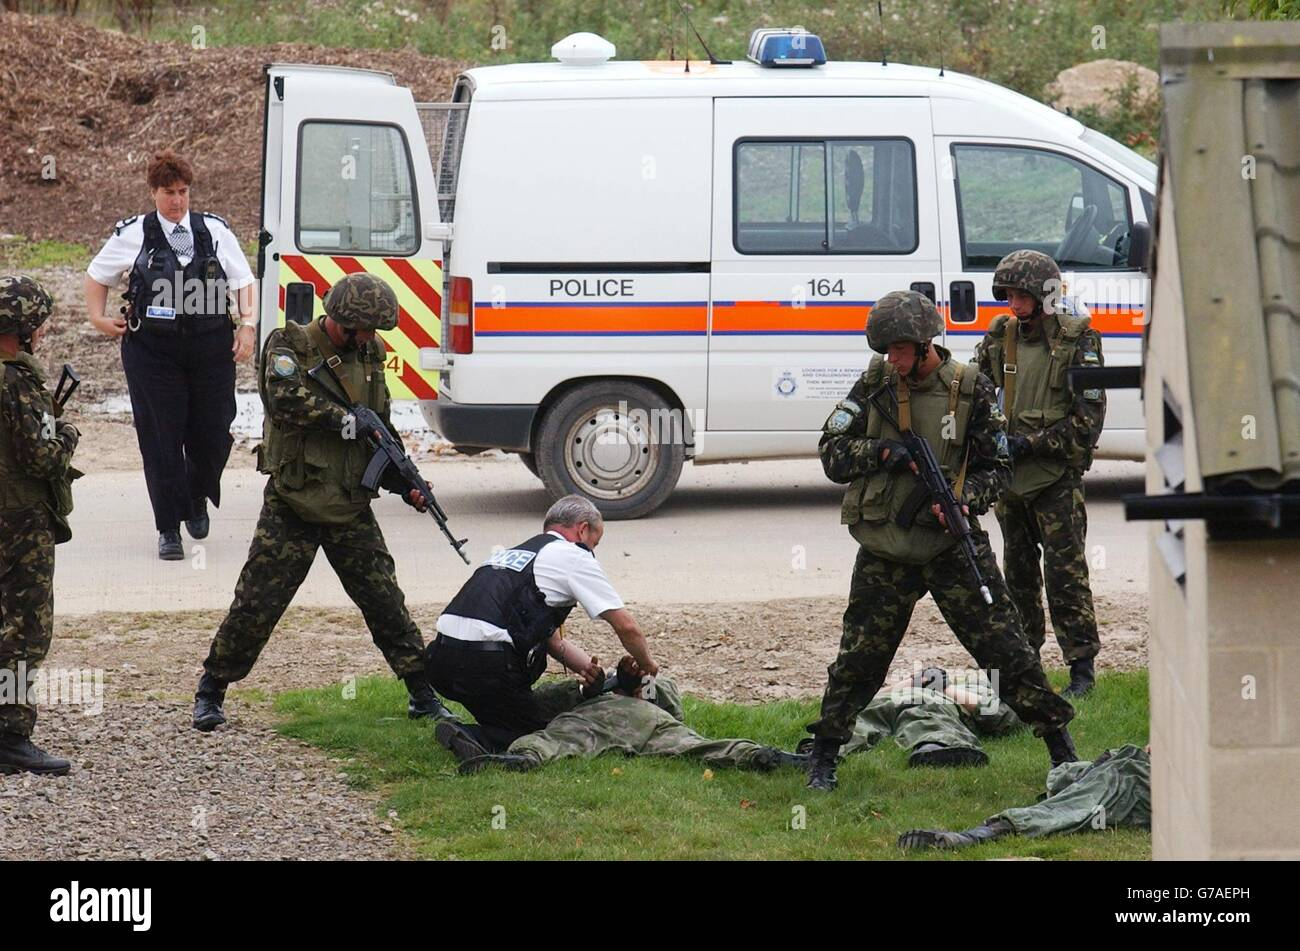 civil disturbance exercise - Stock Image